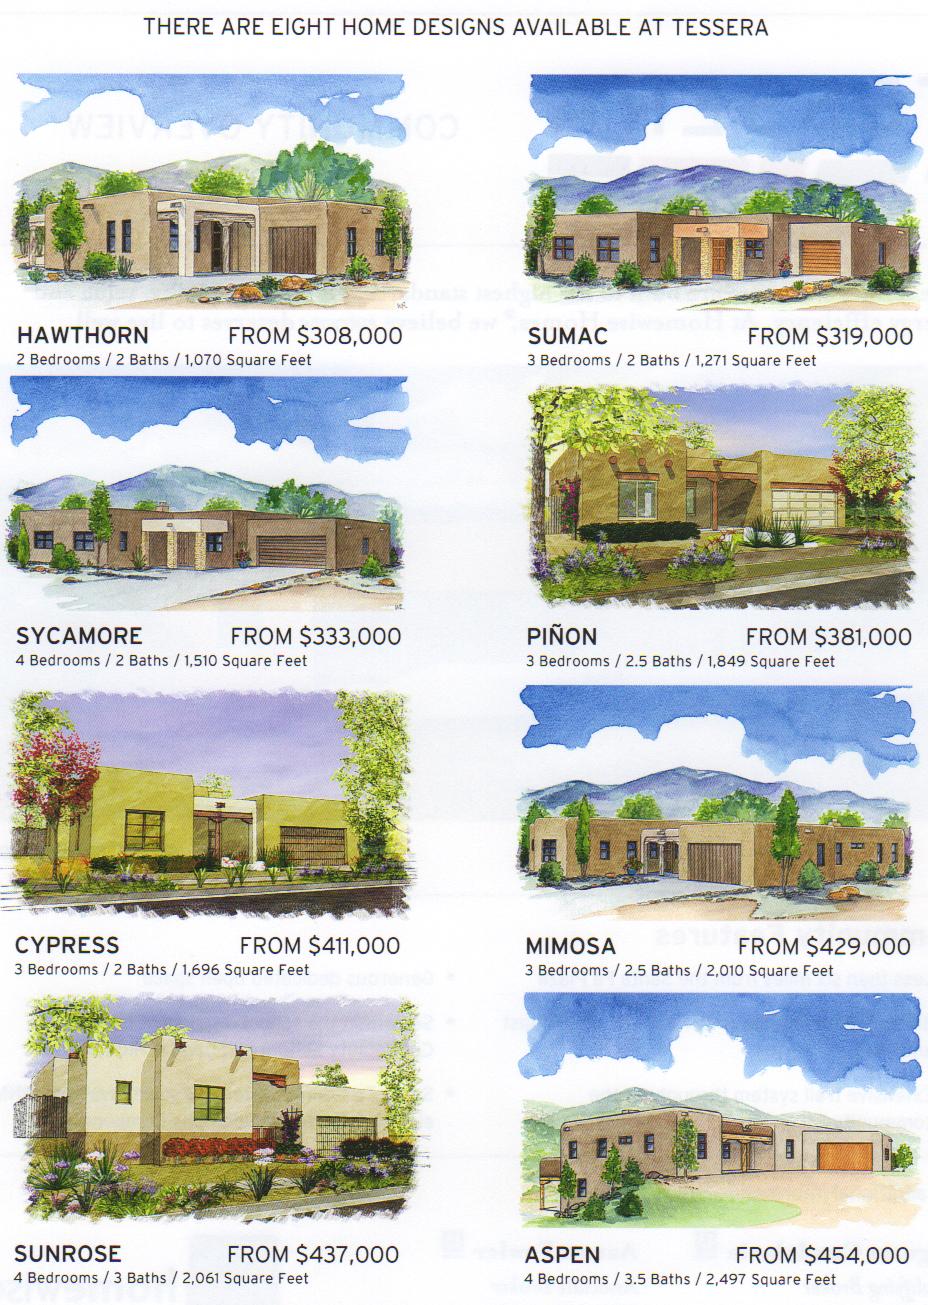 tessera model homes new